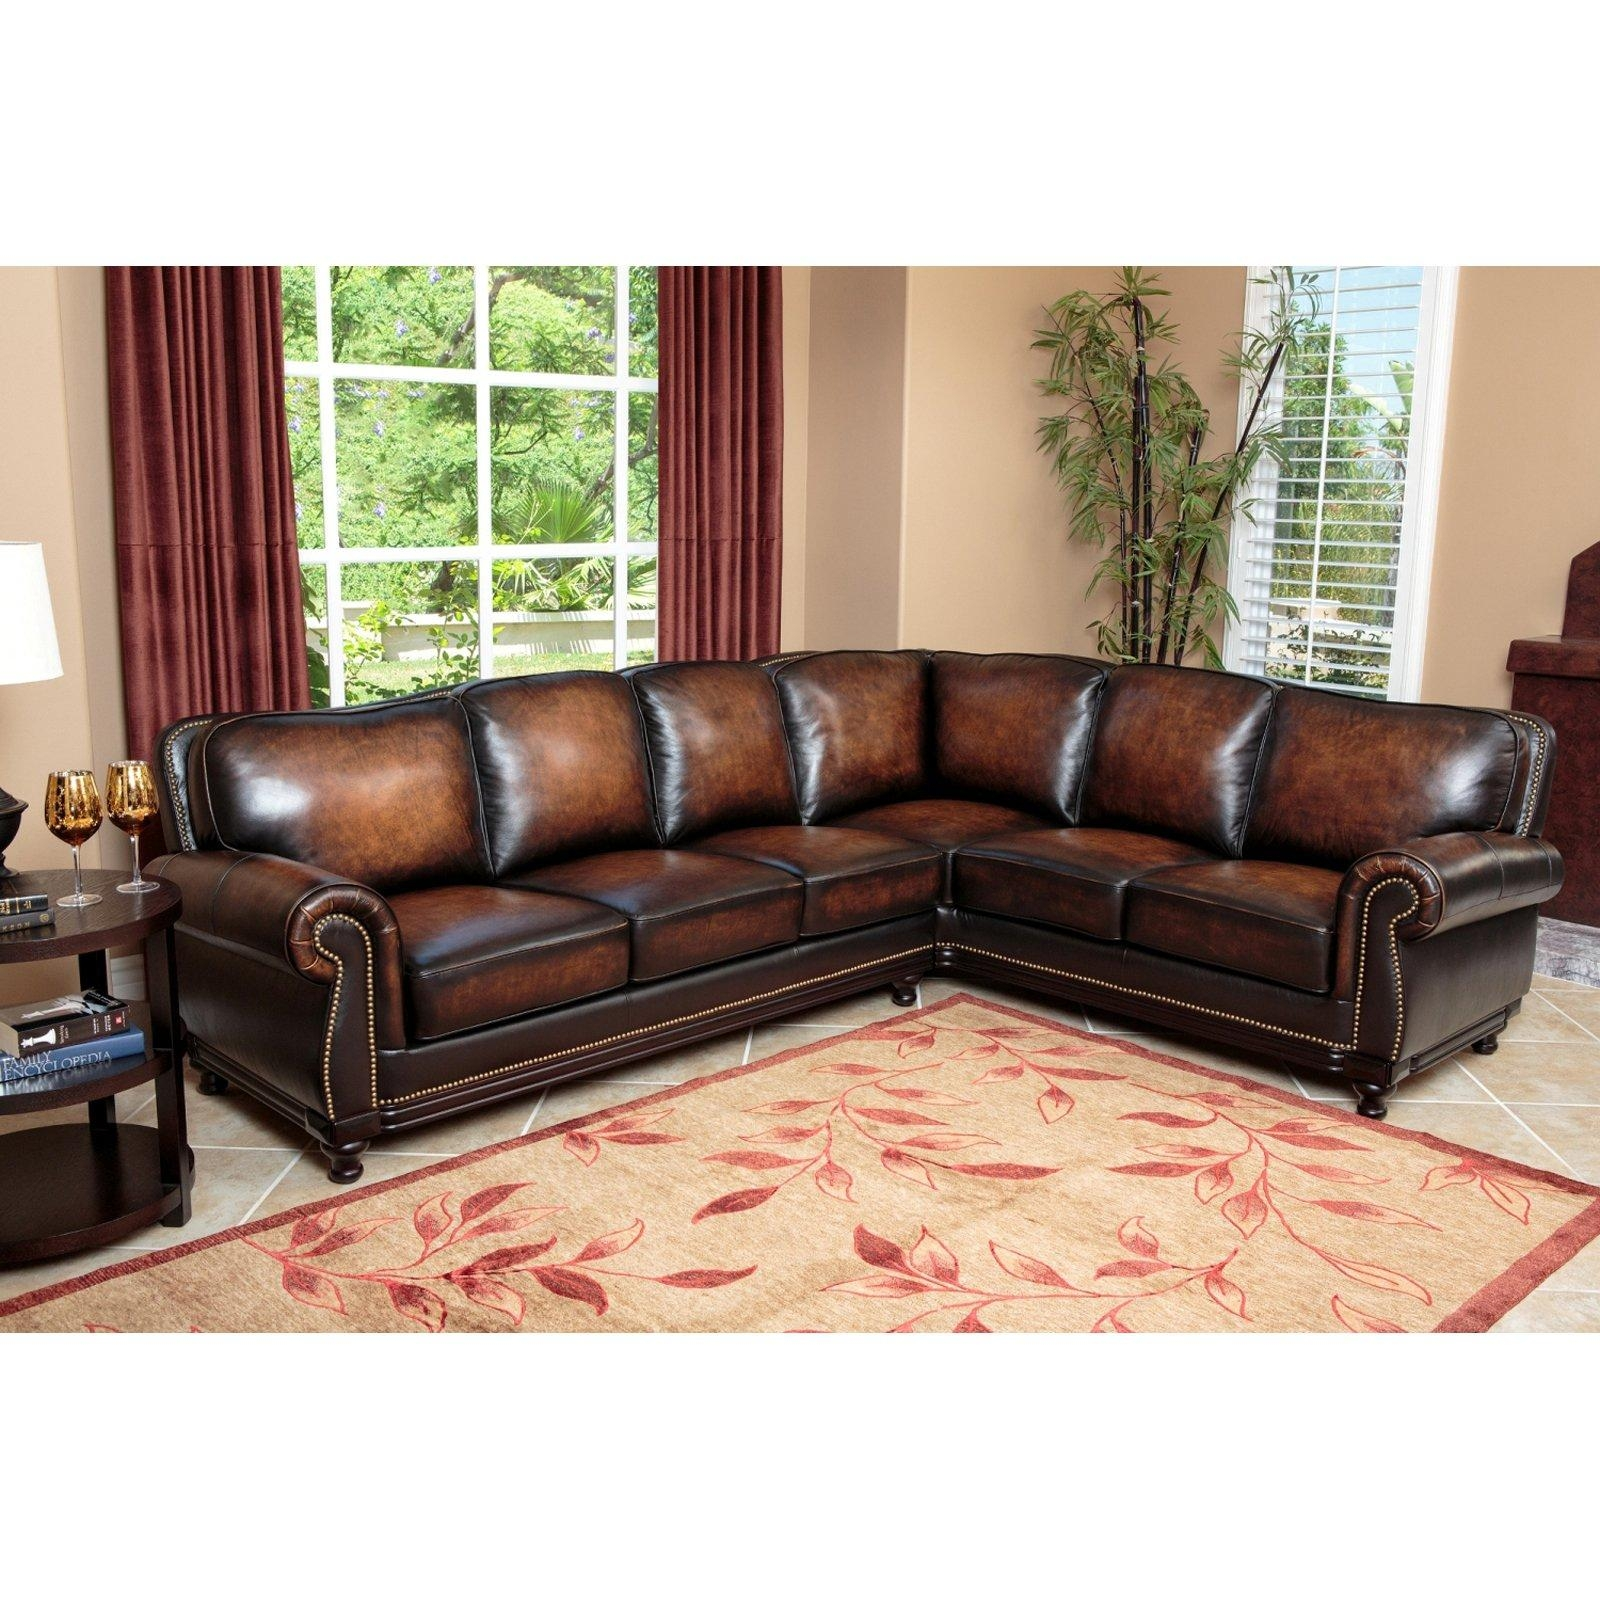 Abbyson Tekana Premium Italian Leather Sectional Sofa – Dark Brown With Abbyson Living Sectional Sofas (Image 12 of 20)